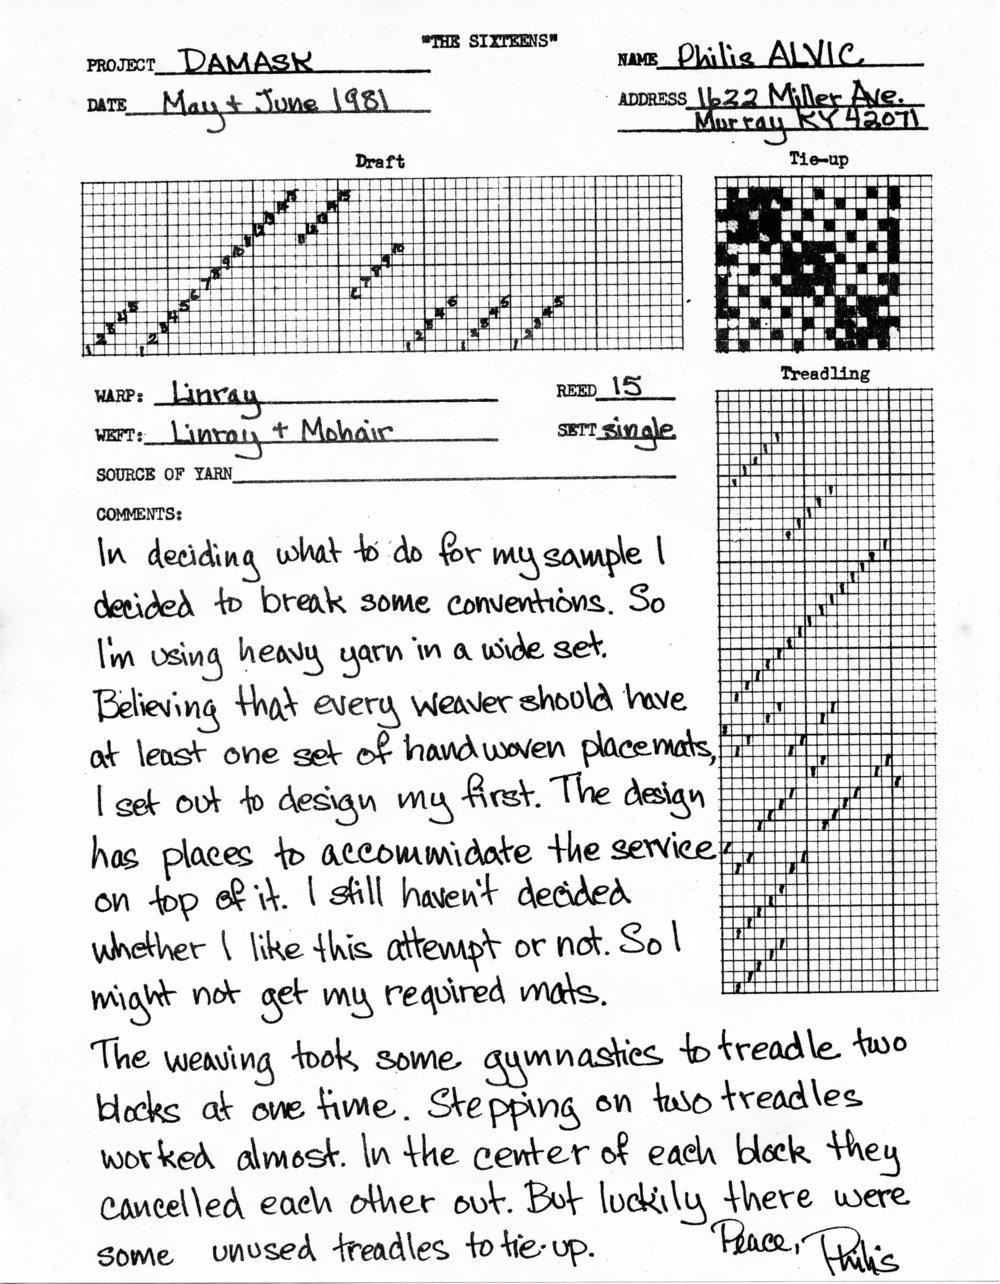 1981_Page_1_Image_0001.jpg